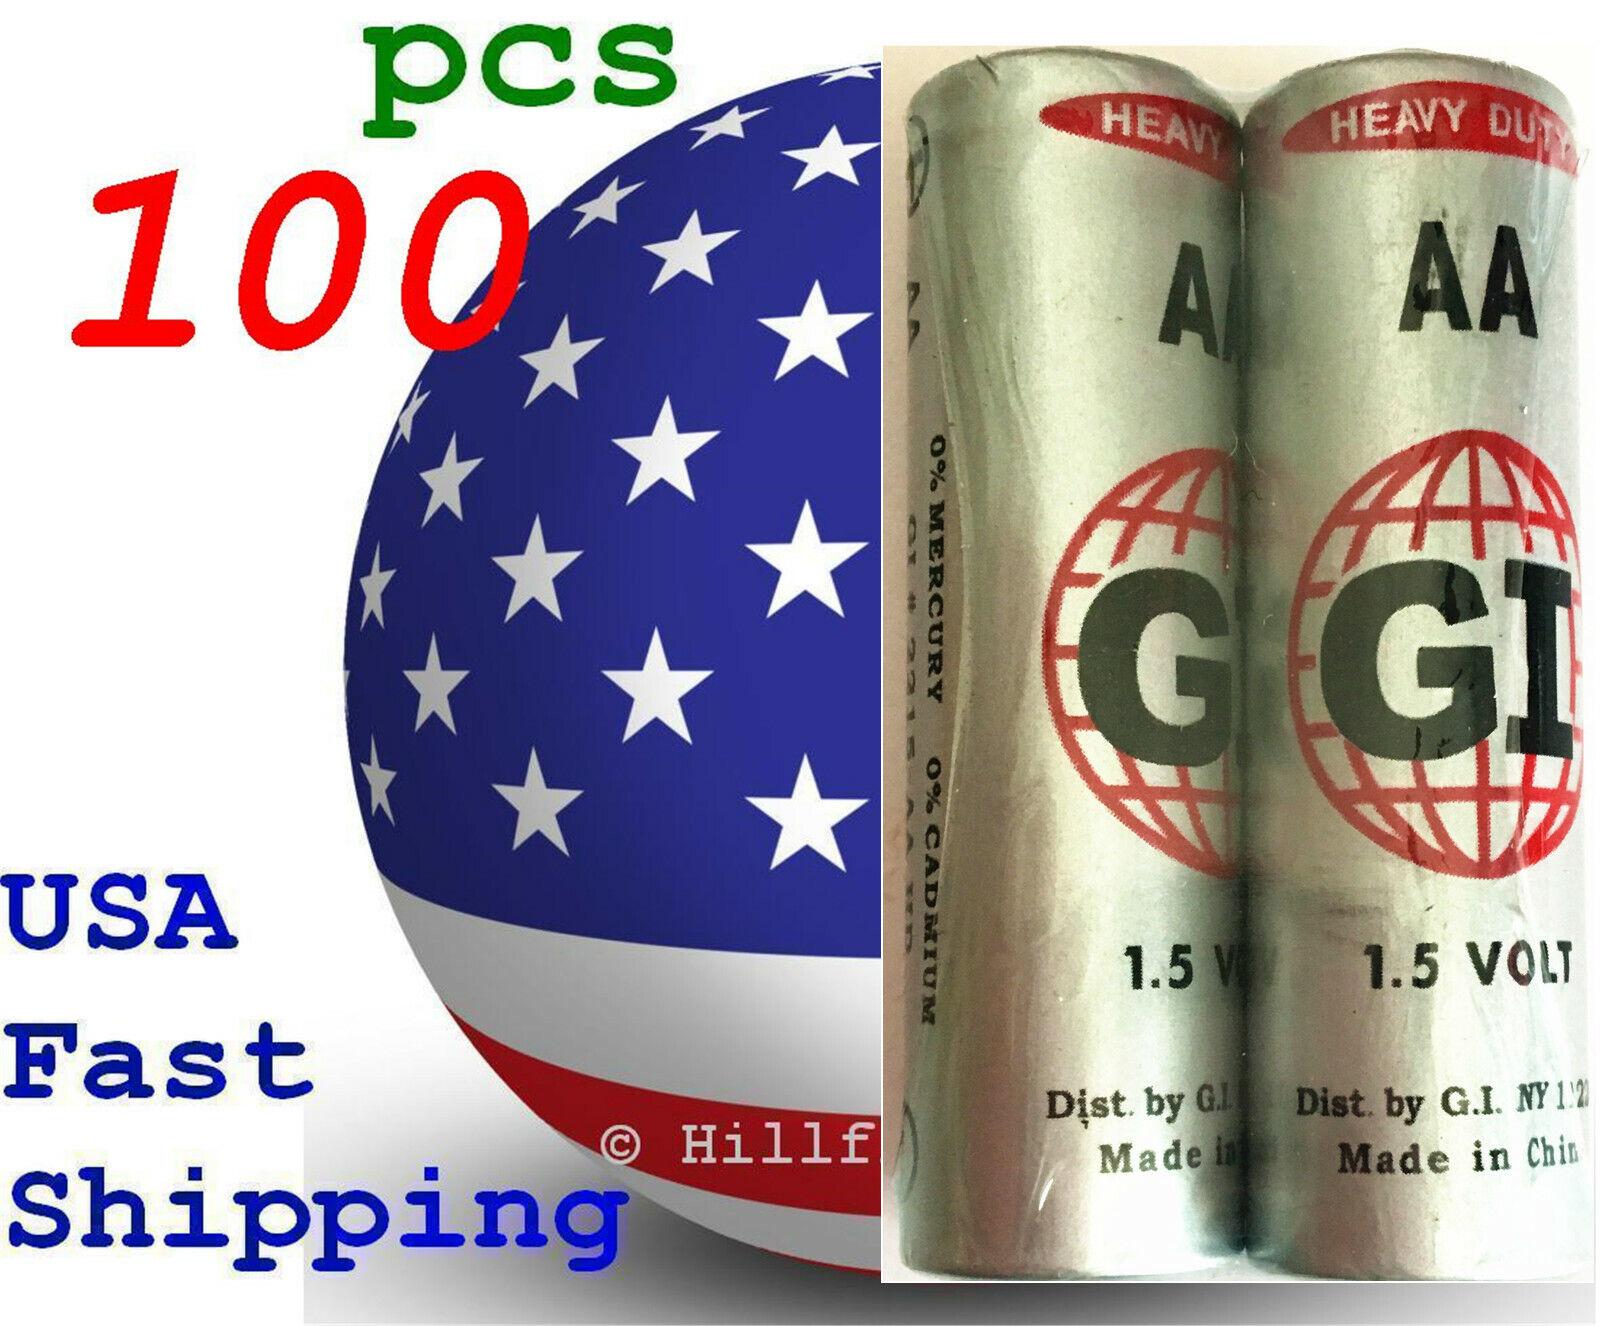 100 pcs Size AA LR6 AM-3 0% Hg Super G.I. Heavy Duty 1.5V Bulk Battery